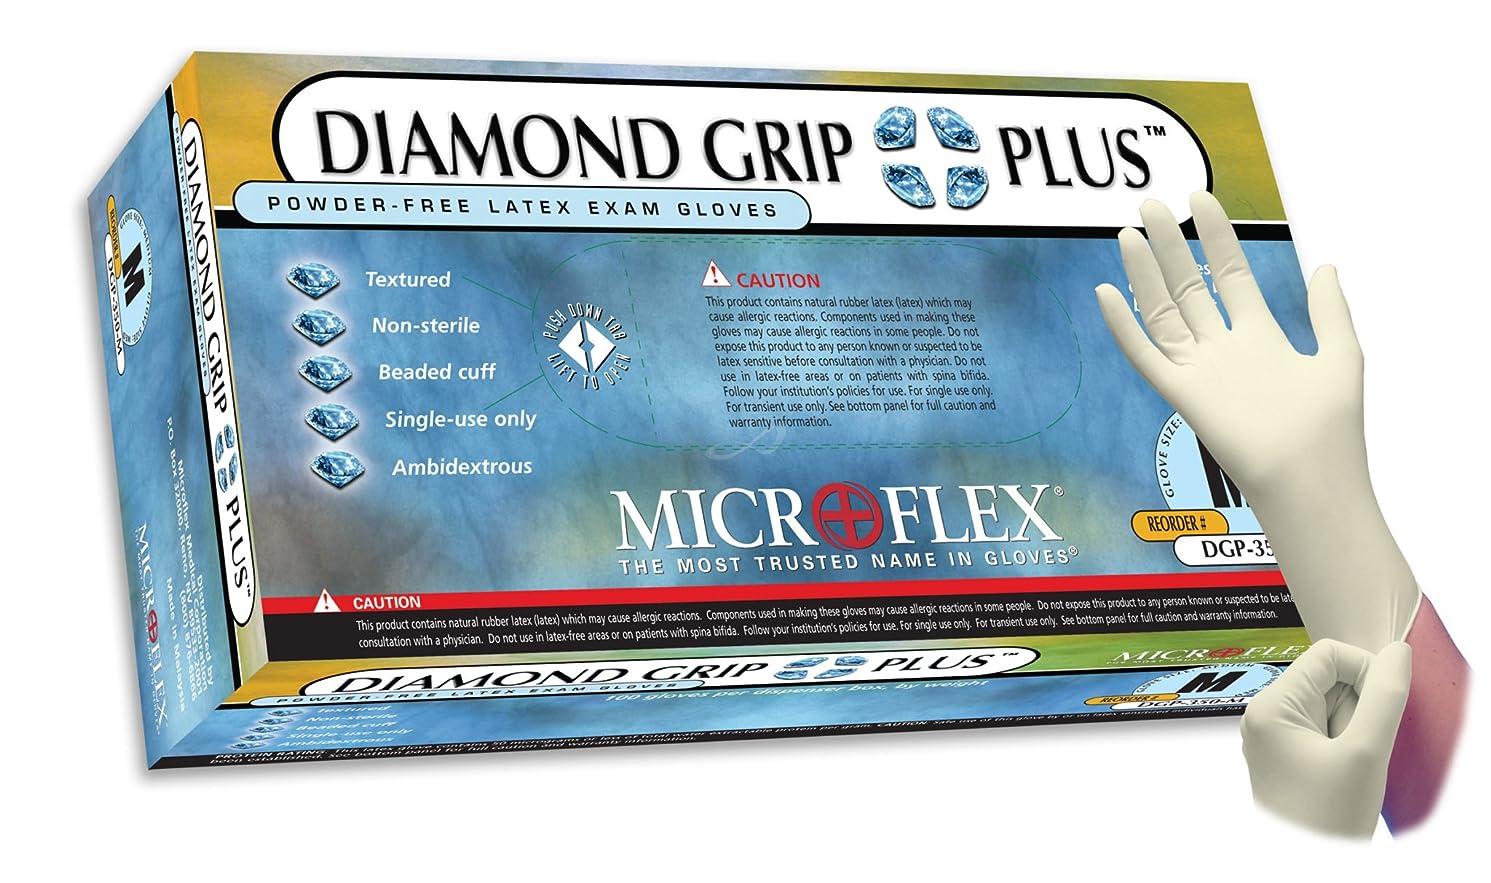 MicroFlex Case Of Diamond Grip Plus PF Latex Exam X-Large